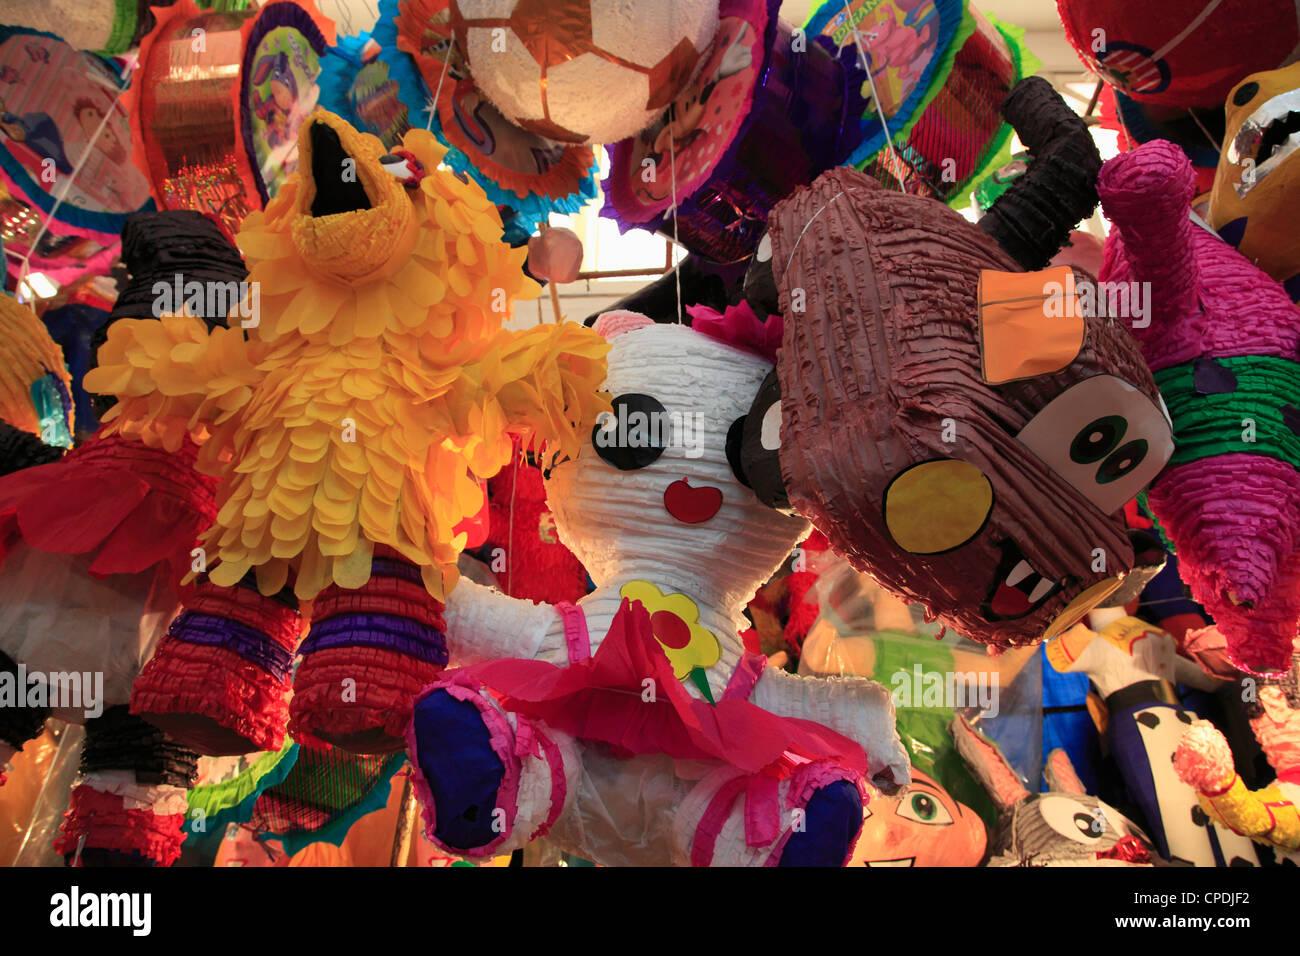 Pinatas, mercado, Xochimilco, Ciudad de México, México, América del Norte Imagen De Stock